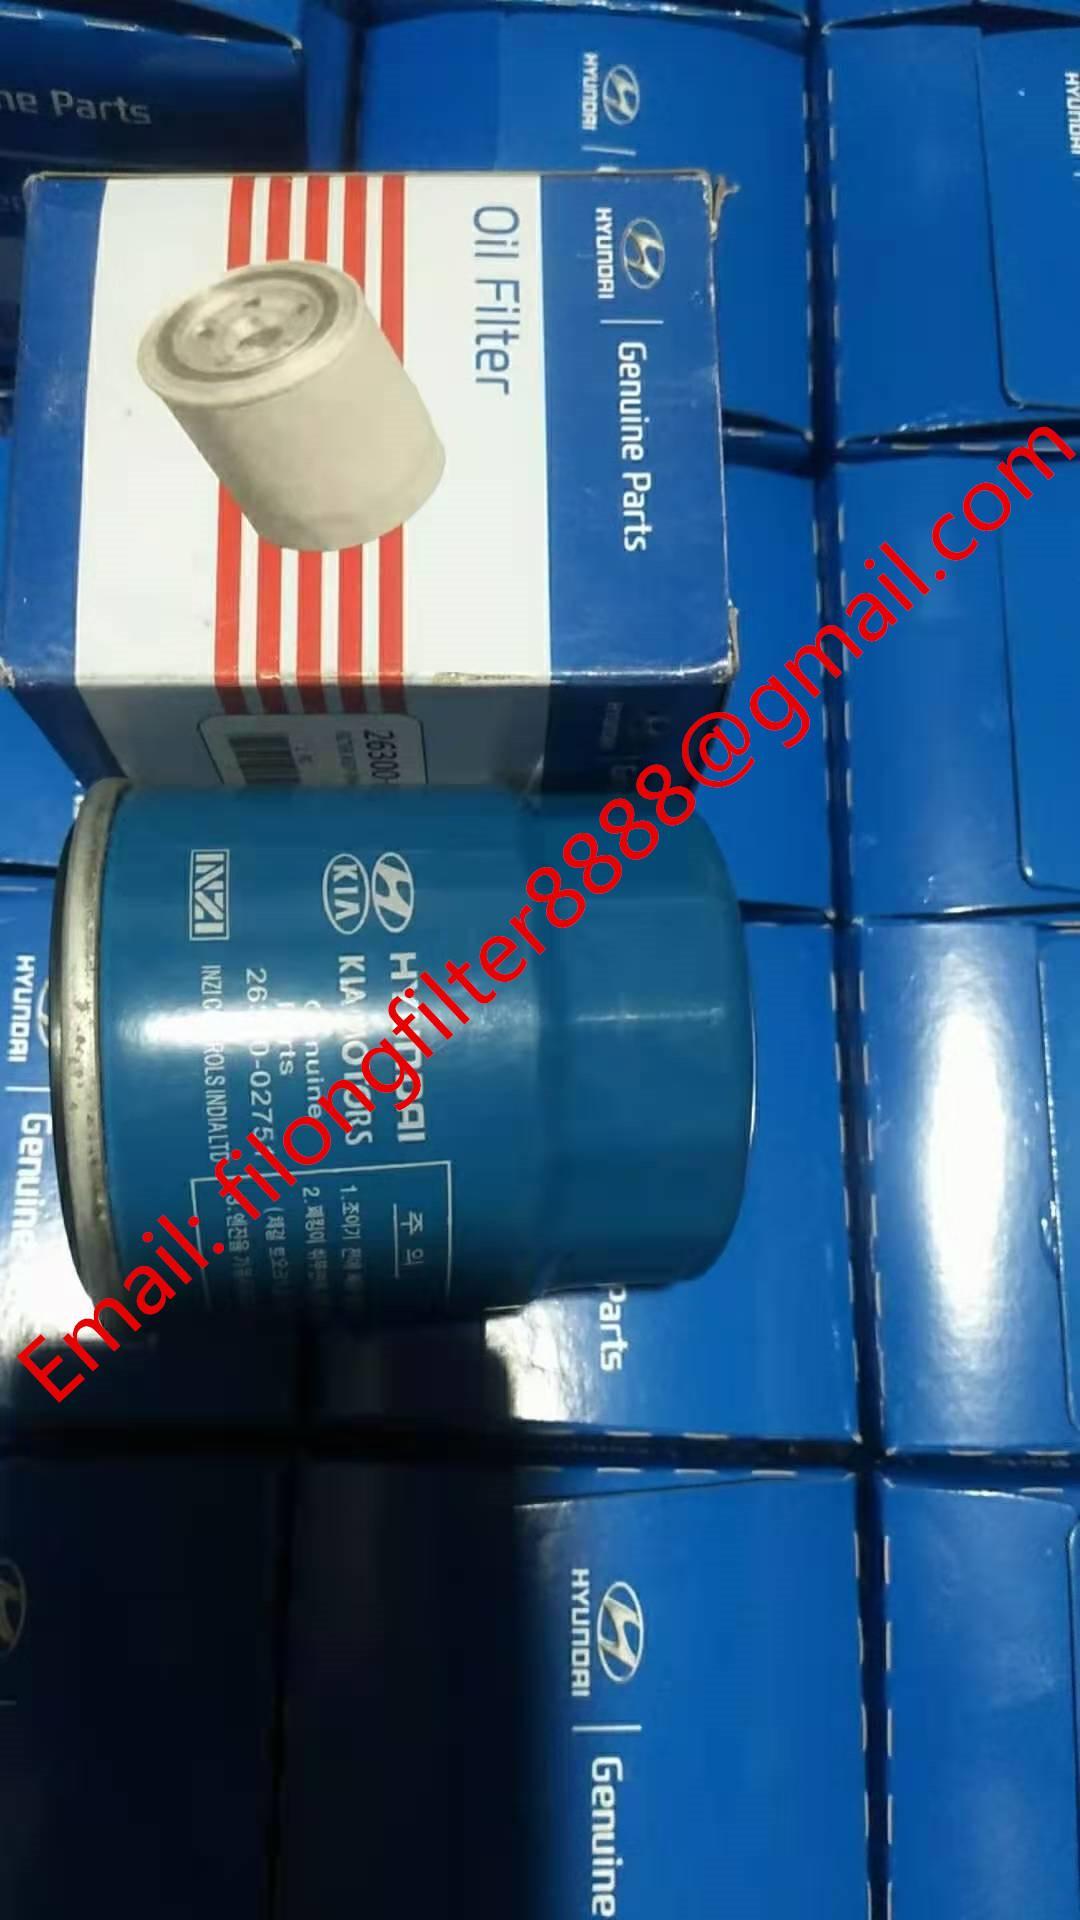 Oil filter series > FO-70000,MD135737, W610/3,OC196 OEM Number: BRILLIANCEX4252E CITROËN1109CG FORD1535505, 1535506, 3396825, 3521840, 3803268, 3891893, 5016958, 5027149, KL0714302B FIAT46544820, 46751179, 55230822, 55256470, 71736161, 71765459 GENERAL MOTORS12582255, 90485456, 90541162, 90541163, 91151707, 91151708, 93156956, 93182630, 94316263 HONDA5400PJ7005, 15400PJ7015, 15400PLC004, 15400PM3003 HYUNDAI2630002750, 2630002751, OJE1514302 ISUZU8943687270 KIA0FE3R14302, FE3R14301, FE3R14302, OJE1514302 KOMATSUYM12915035151 MAZDAFE3R14302, FEYO14302, G6Y014302A, JE1514302, JEY014302, JEY0143029A, JEY014302A, JEYO14302, RFY0143029A MERCEDES-BENZ0001802810 MITSUBISHI0A4000100, 30A4000102, MD05281090, MD135737, MD136466, MD320276, MD321589, MD325714, MD332687, MD352627, MD360935, MR984204, MZ690070, MZ690072, MZ690115, MZ690116 NISSAN1520831U00, 152089F60A OPEL649013, 649014, 649020, 90511146, 94455103, VOF225, VOF500, VOF88 PEUGEOT1109AC, 1109CG PROTONPW510577, PW510577E SAME00947941 SMART0001802810 VAUXHALL4318092, VOF225, VOF500, VOF88 VOLVO11715849, 30866266 Reference Number: ACDelcoX146 ALCO FILTERSP1001 AMC FilterIO3324, MO511, NO242C BALDWINB1402, B1431 BLUE PRINTADC42112, ADG02109, ADH22113, ADH22114, ADL142102, ADM52105, ADM52107, ADN12111, ADZ92115 BOSCH0451103372, 0986452041, 0986452060, F026407025, F026408736, O736 CHAMPIONF116, F126 CLEANDO925/A COMLINECHN11562, CMZ11413, CMZ11414, CNS11219, EOF074, EOF150, EOF150, EOF150, EOF185 COOPERSZ1128, Z1129 CoopersFiaamFT5368, FT5405, FT5407 CROSLAND2112, 2142 DELPHIFX0066, FX0138, FX0160 DONALDSONP502007, P502047, P502051, P502057, P502063, P552849 FILTRONOP575, OP597 FILONGFO70000 FRAMPH4913, PH5317, PH5343, PH6017A HENGST FILTERH97W02, H97W03, H97W05, H97W06, H97W08, H97W11 JAPANPARTSJFO307, JFO316, JFO510 JS FILTERC415J KNECHTOC194, OC196, OC495, OC521, OC617 MAGNETI MARELLI152071758747, 71758747 MAHLE FILTEROC194, OC196, OC495, OC521, OC617 MANN-FILTERW610/2, W610/3, W610/6, W610/7, W610/82, W67 MECAFILTERELH